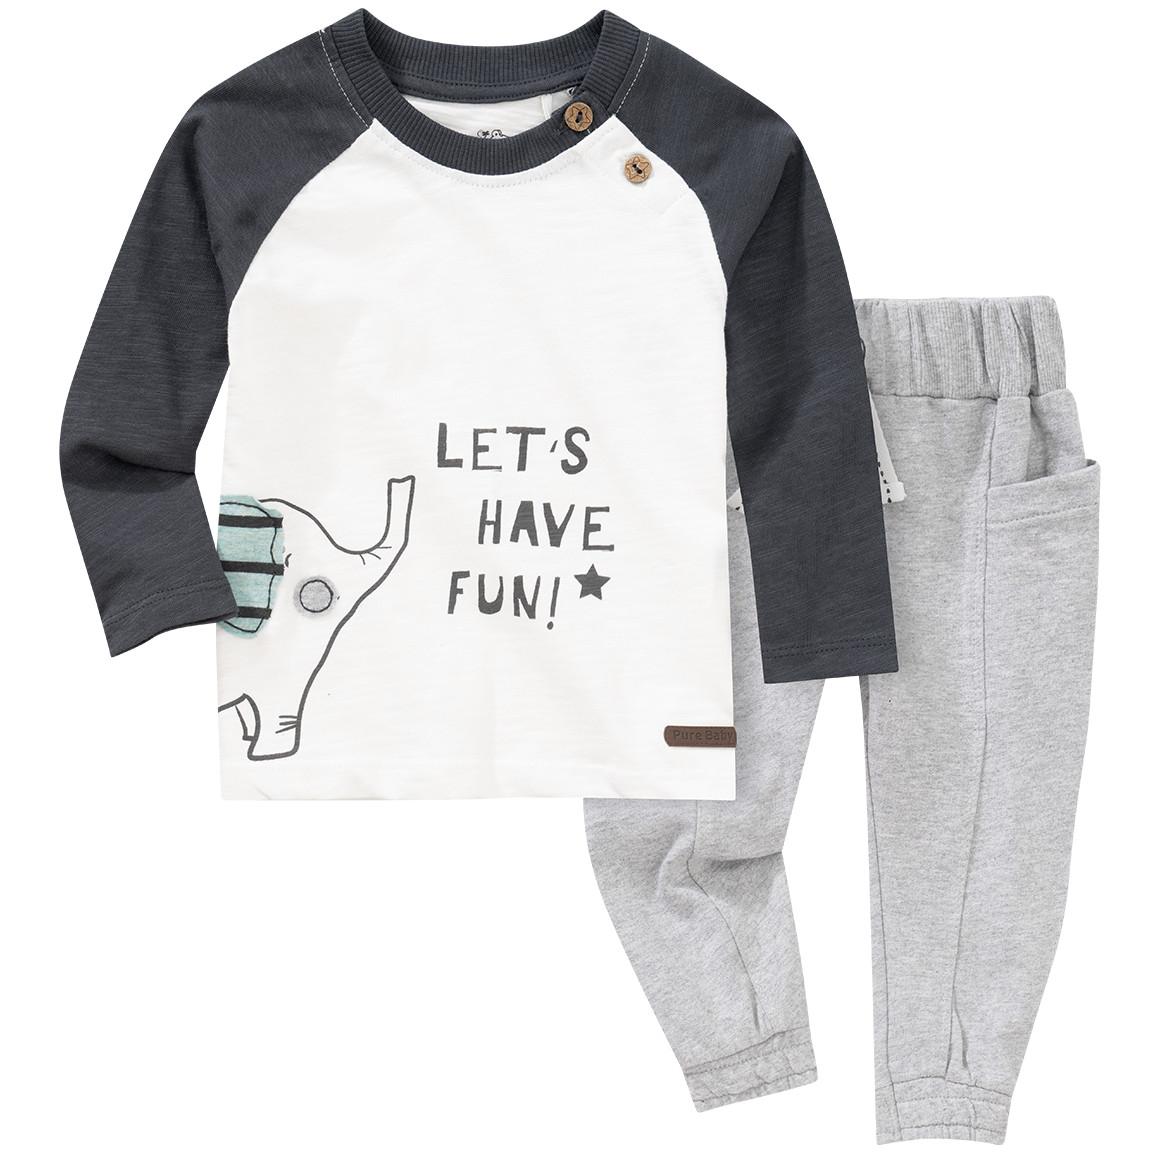 Babysets - Baby Langarmshirt und Jogginghose im Set - Onlineshop Ernstings family